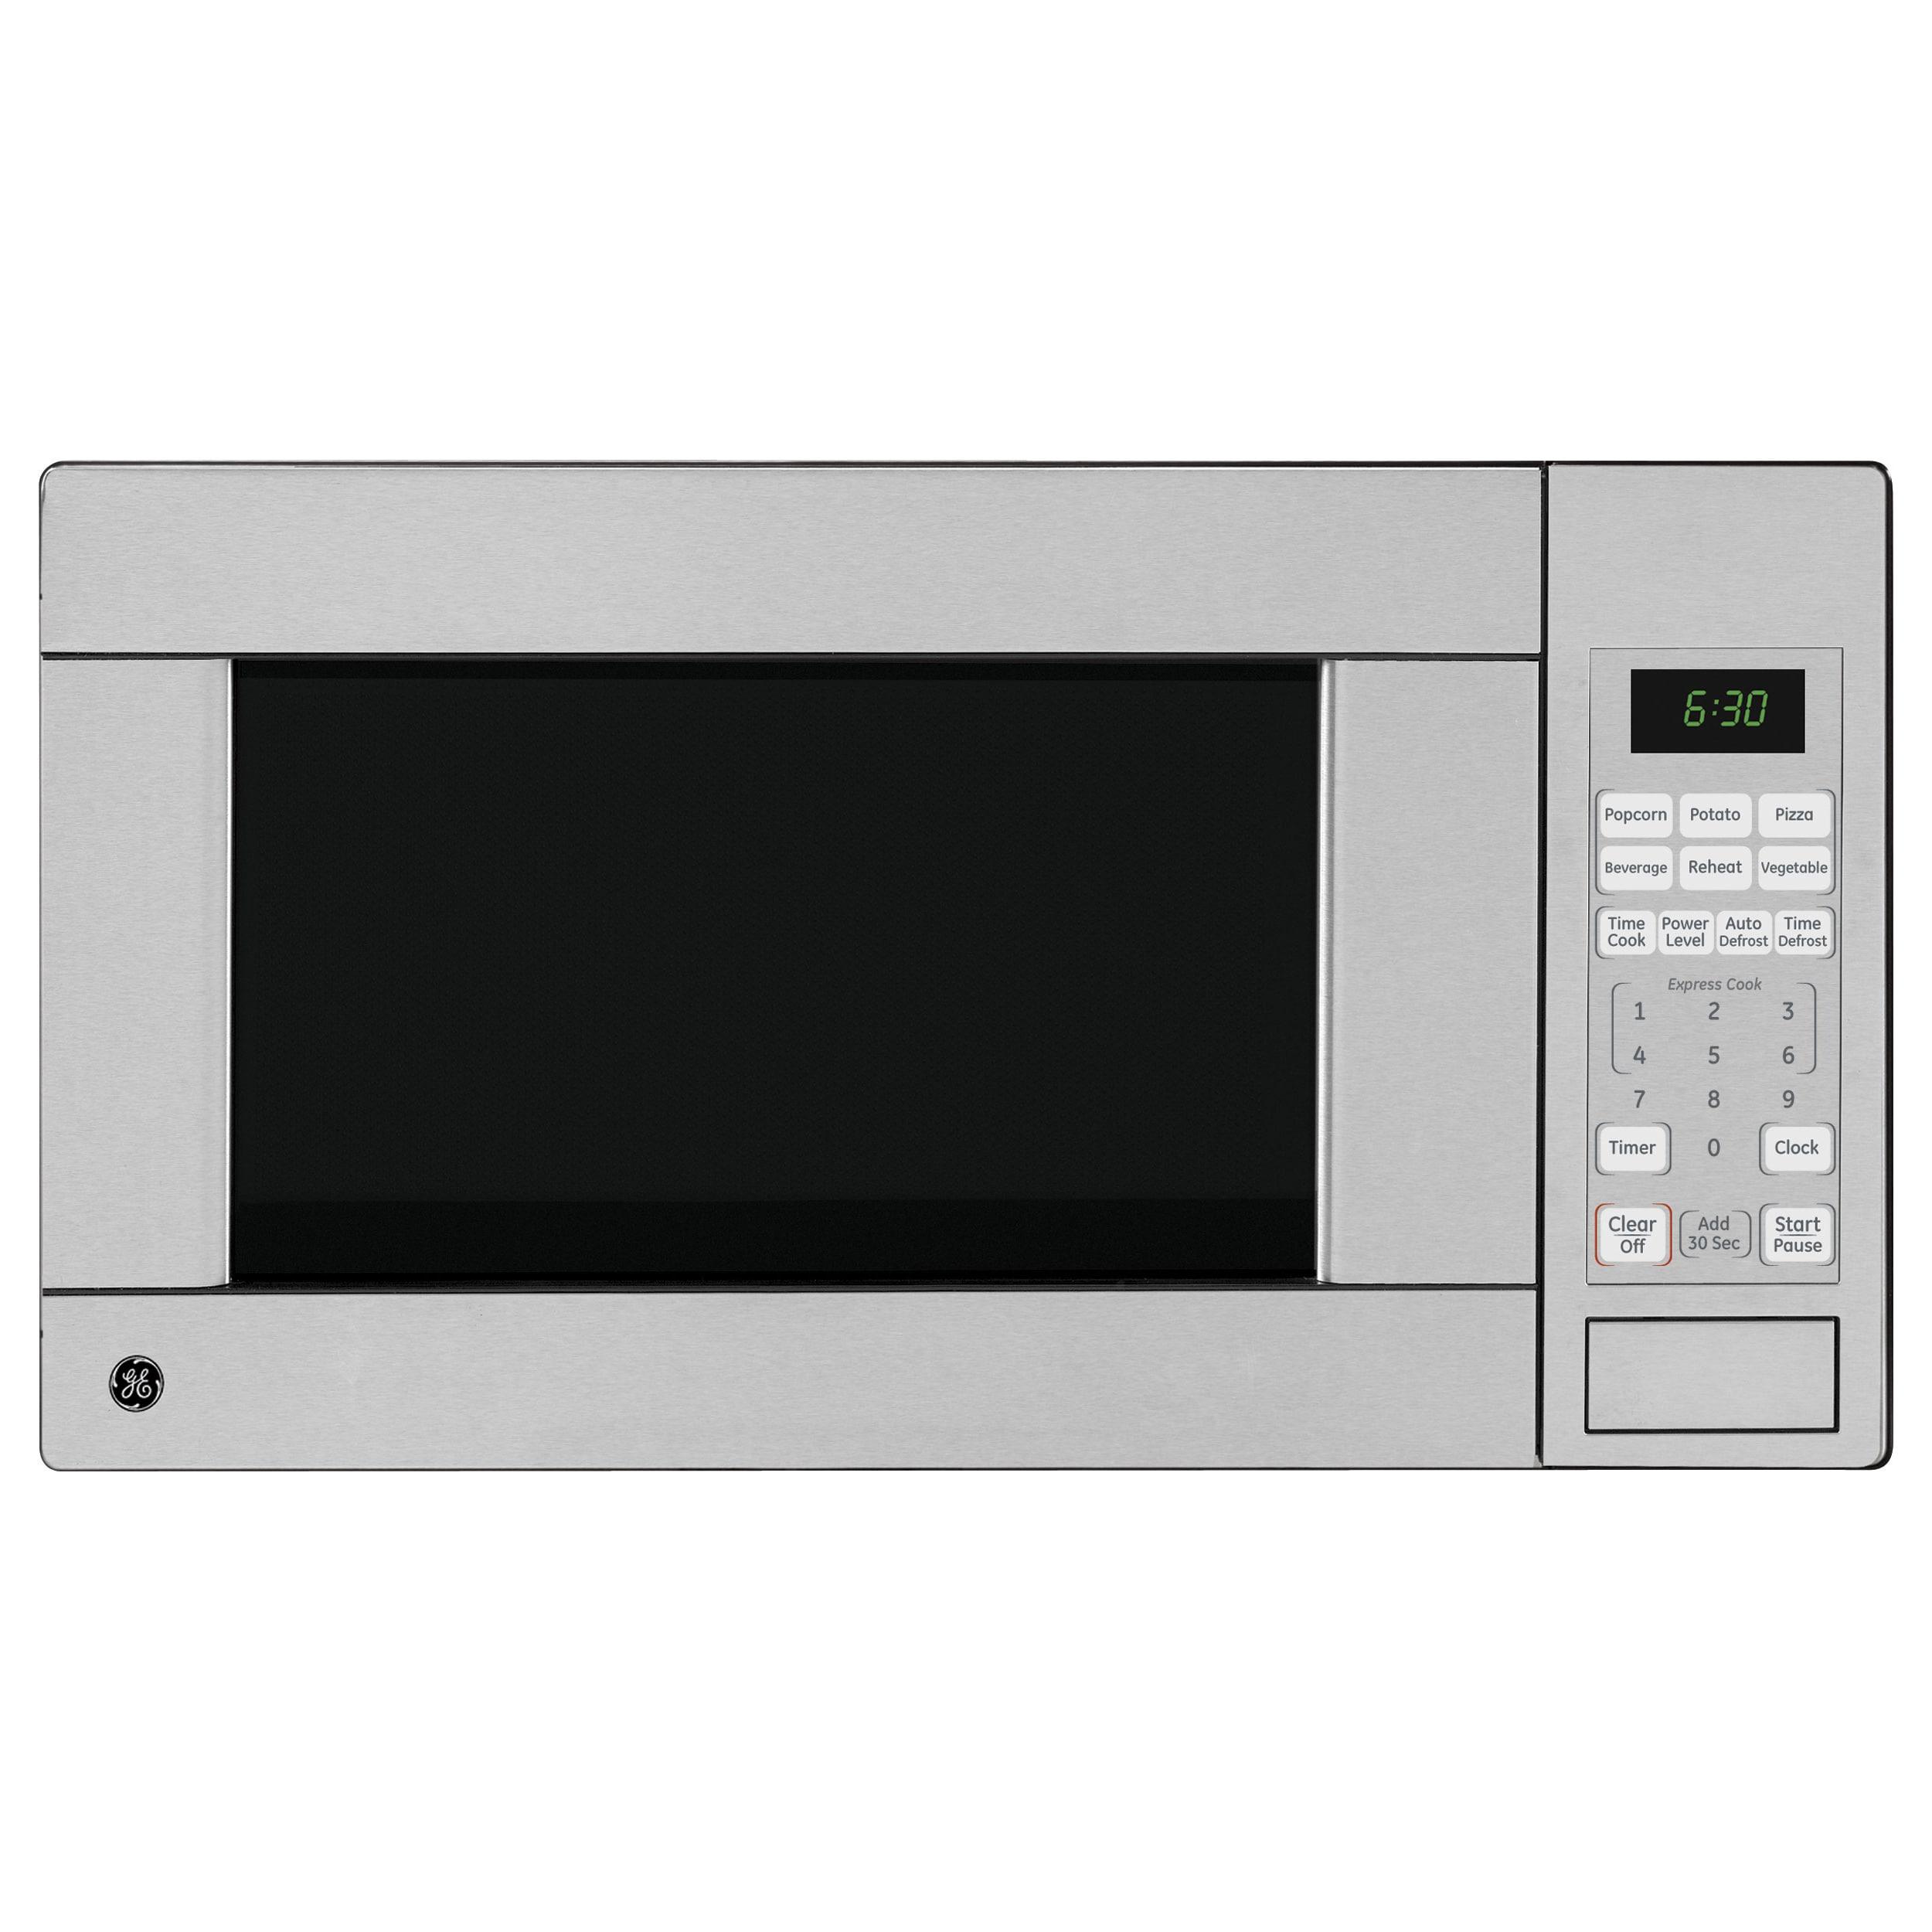 Countertop Microwave Ge : ge countertop microwave oven ge countertop microwave oven model ...